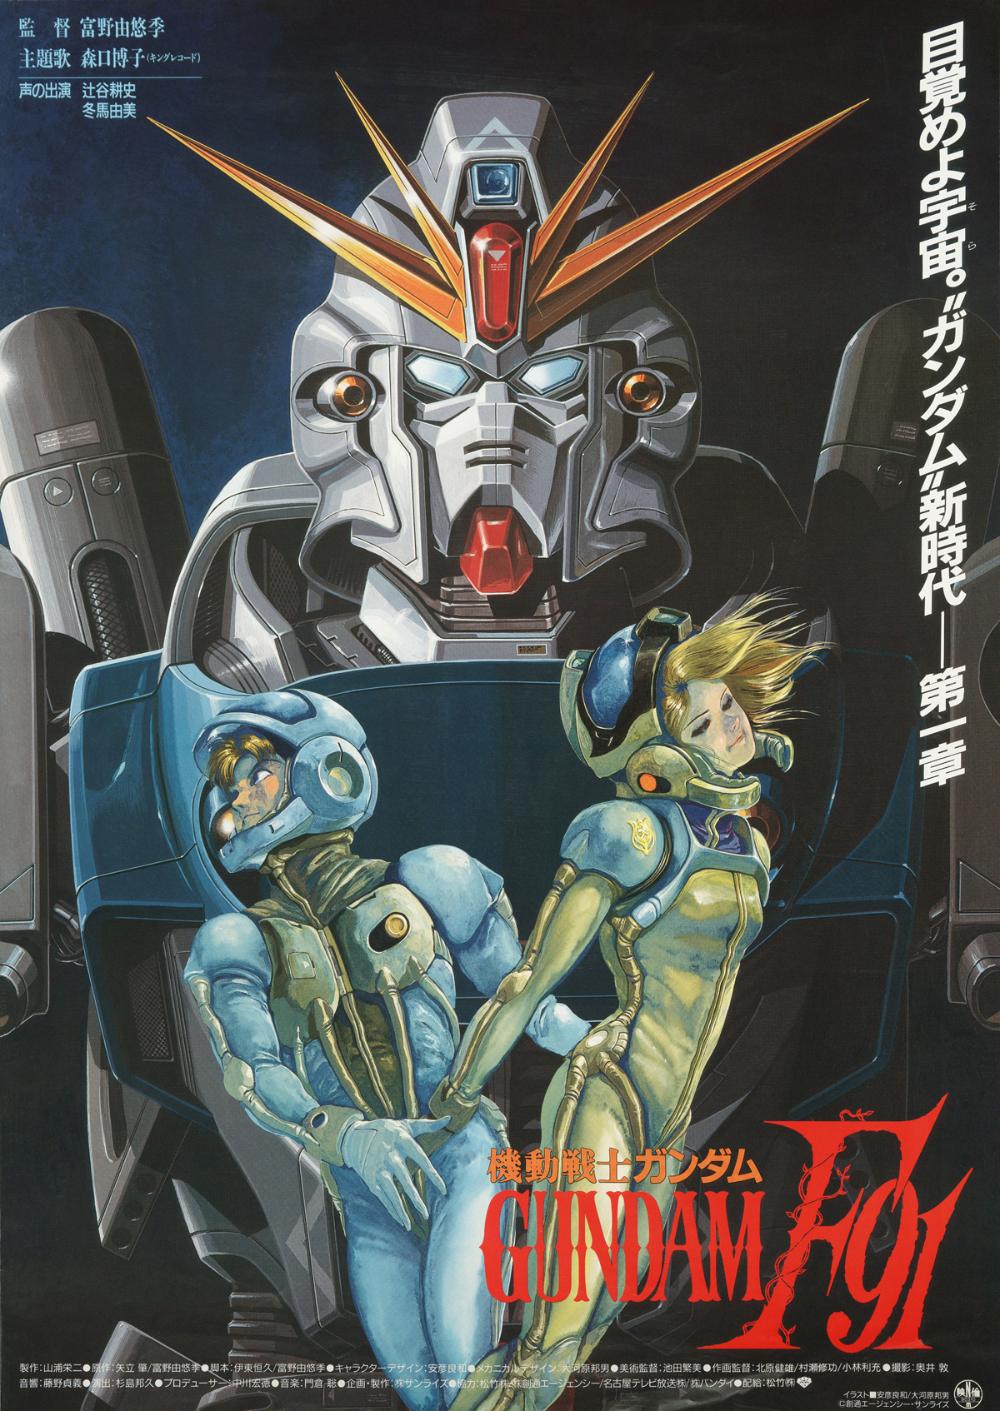 Anime Manga Image By Ova Lvma In 2020 Gundam Gundam Art